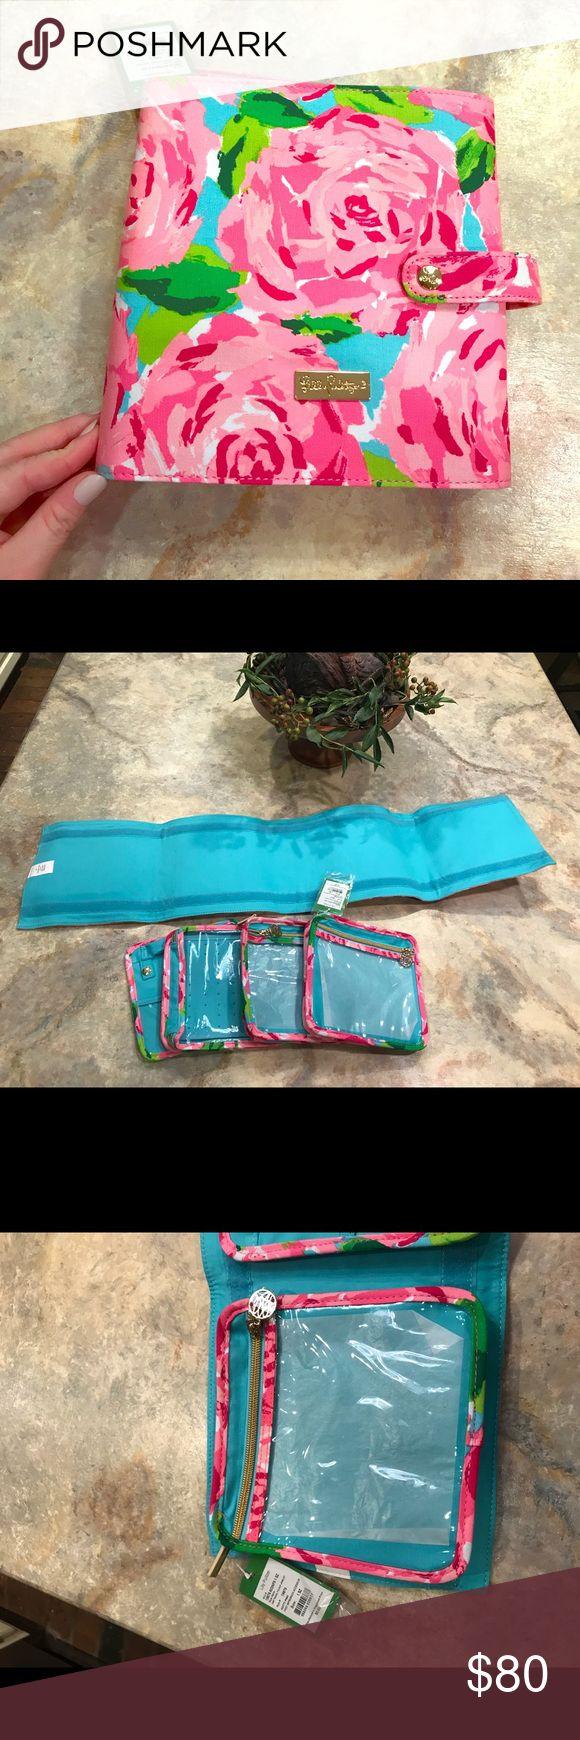 HPFI Lilly Pulitzer jewelry travel case hotty pink New with tags Lilly Pulitzer Bags Travel Bags